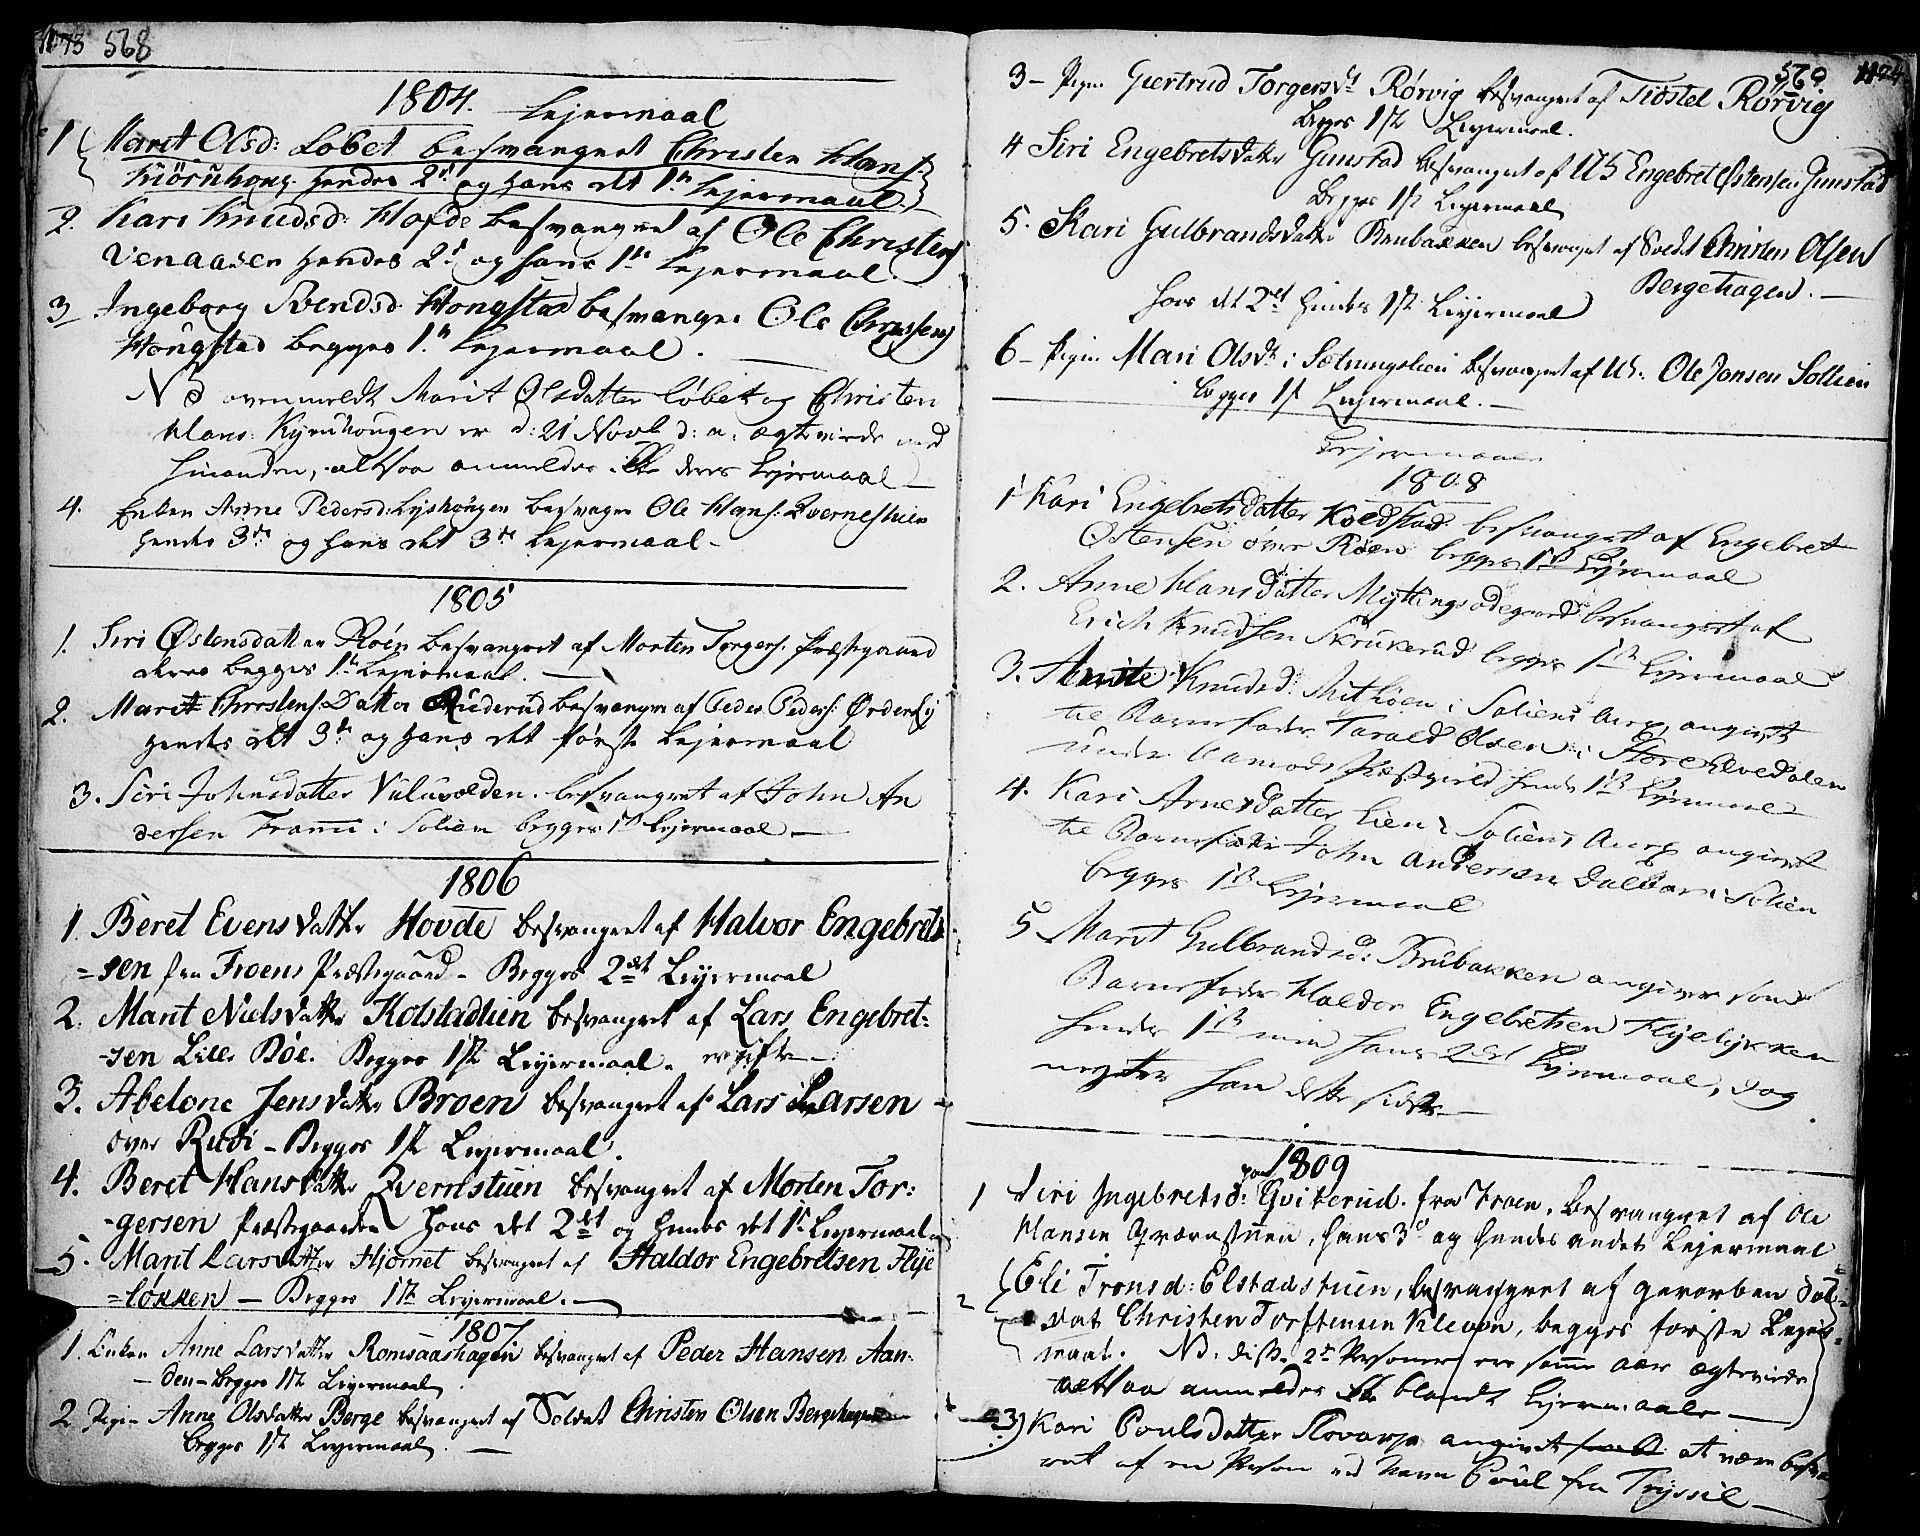 SAH, Ringebu prestekontor, Ministerialbok nr. 3, 1781-1820, s. 568-569